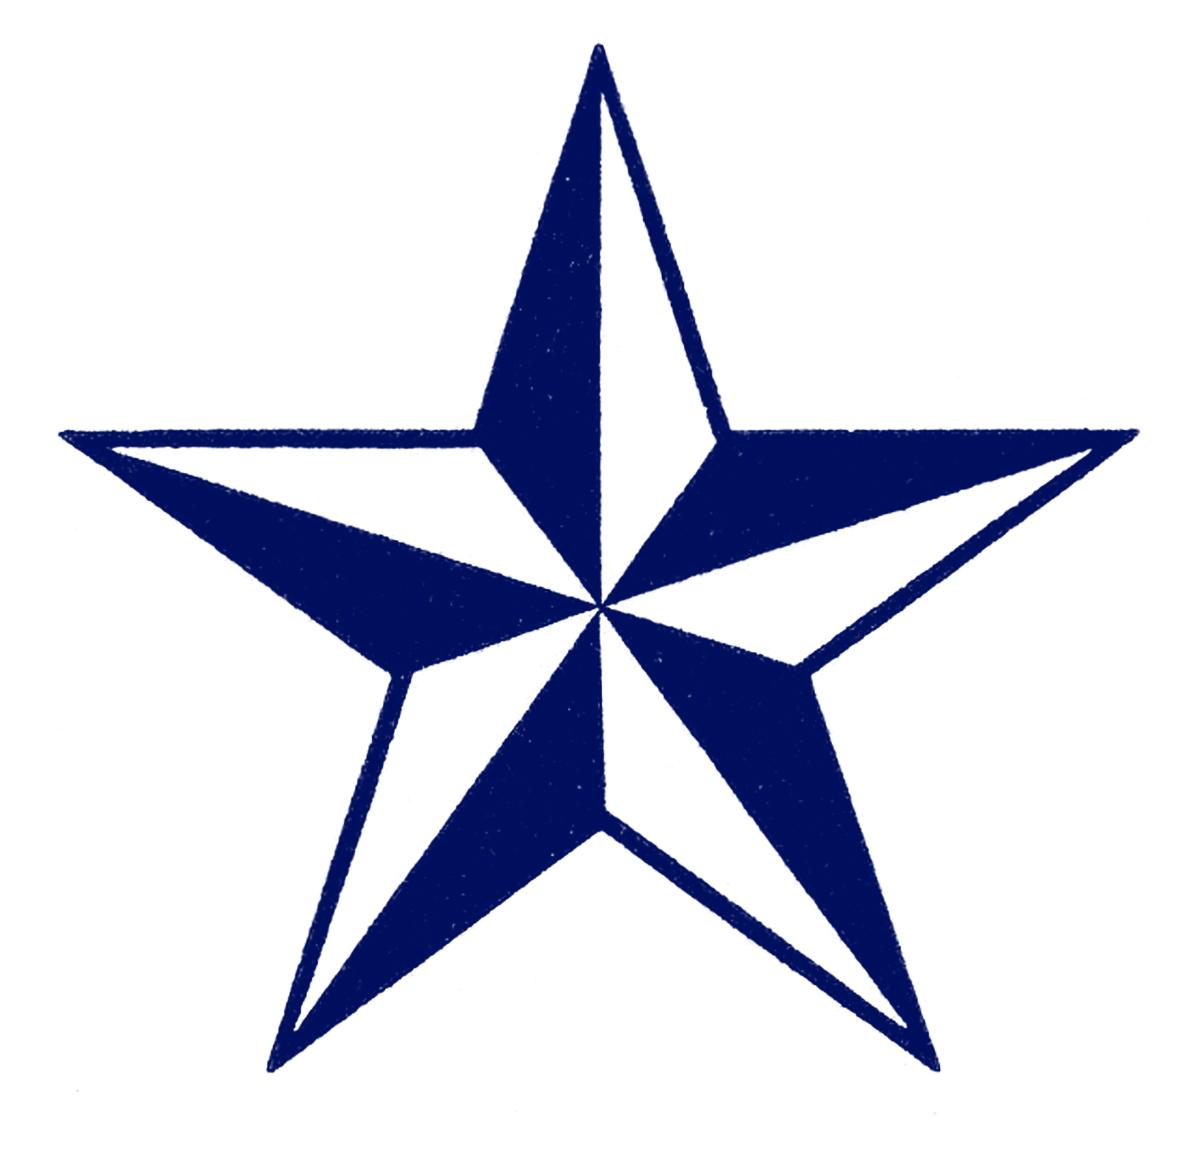 Star clipart star.